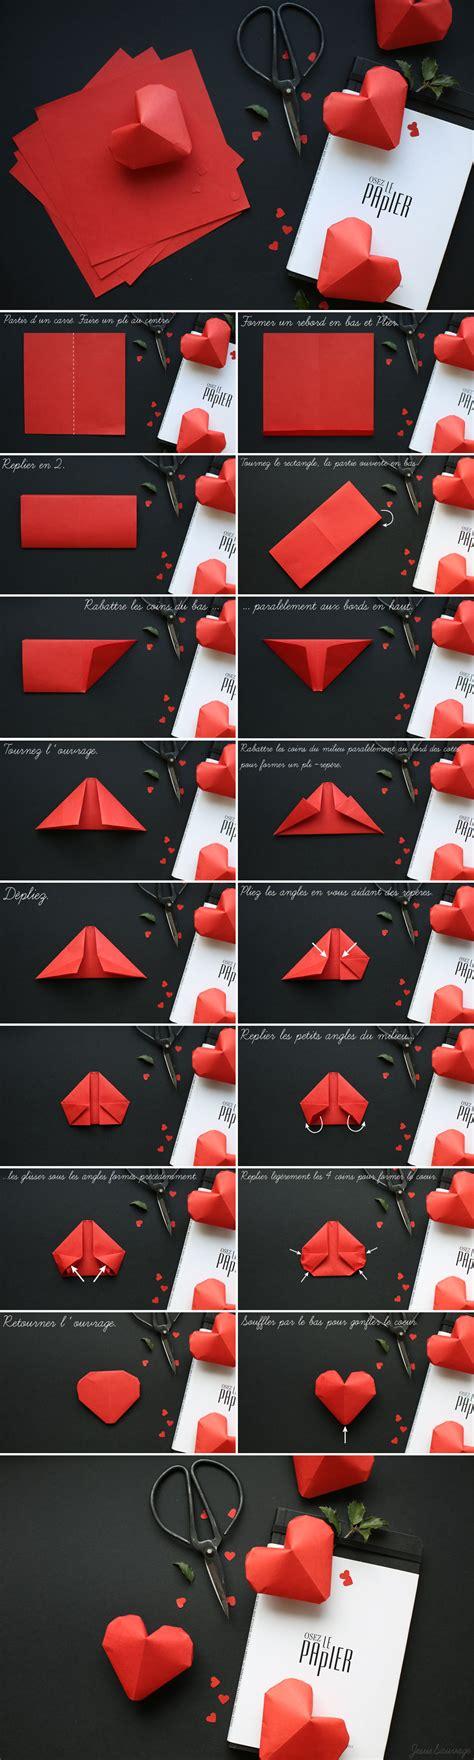 diy paper crafts tutorials diy paper crafts tutorials homesthetics net 2